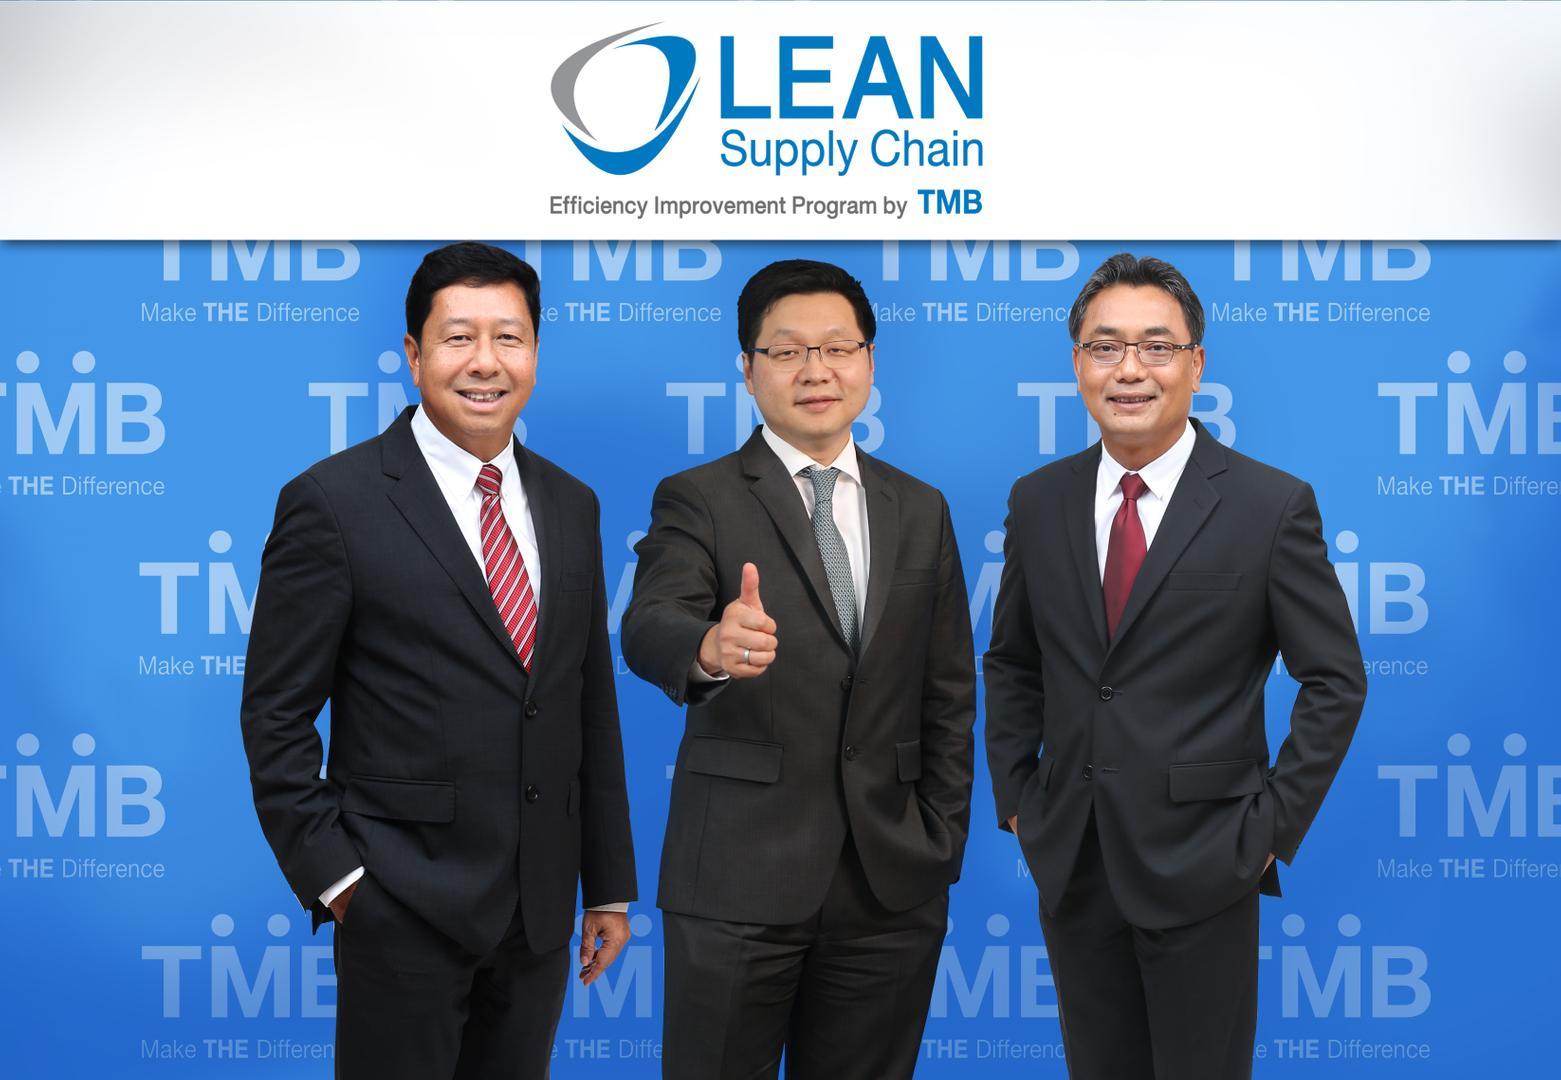 Lean Supply Chain by TMB